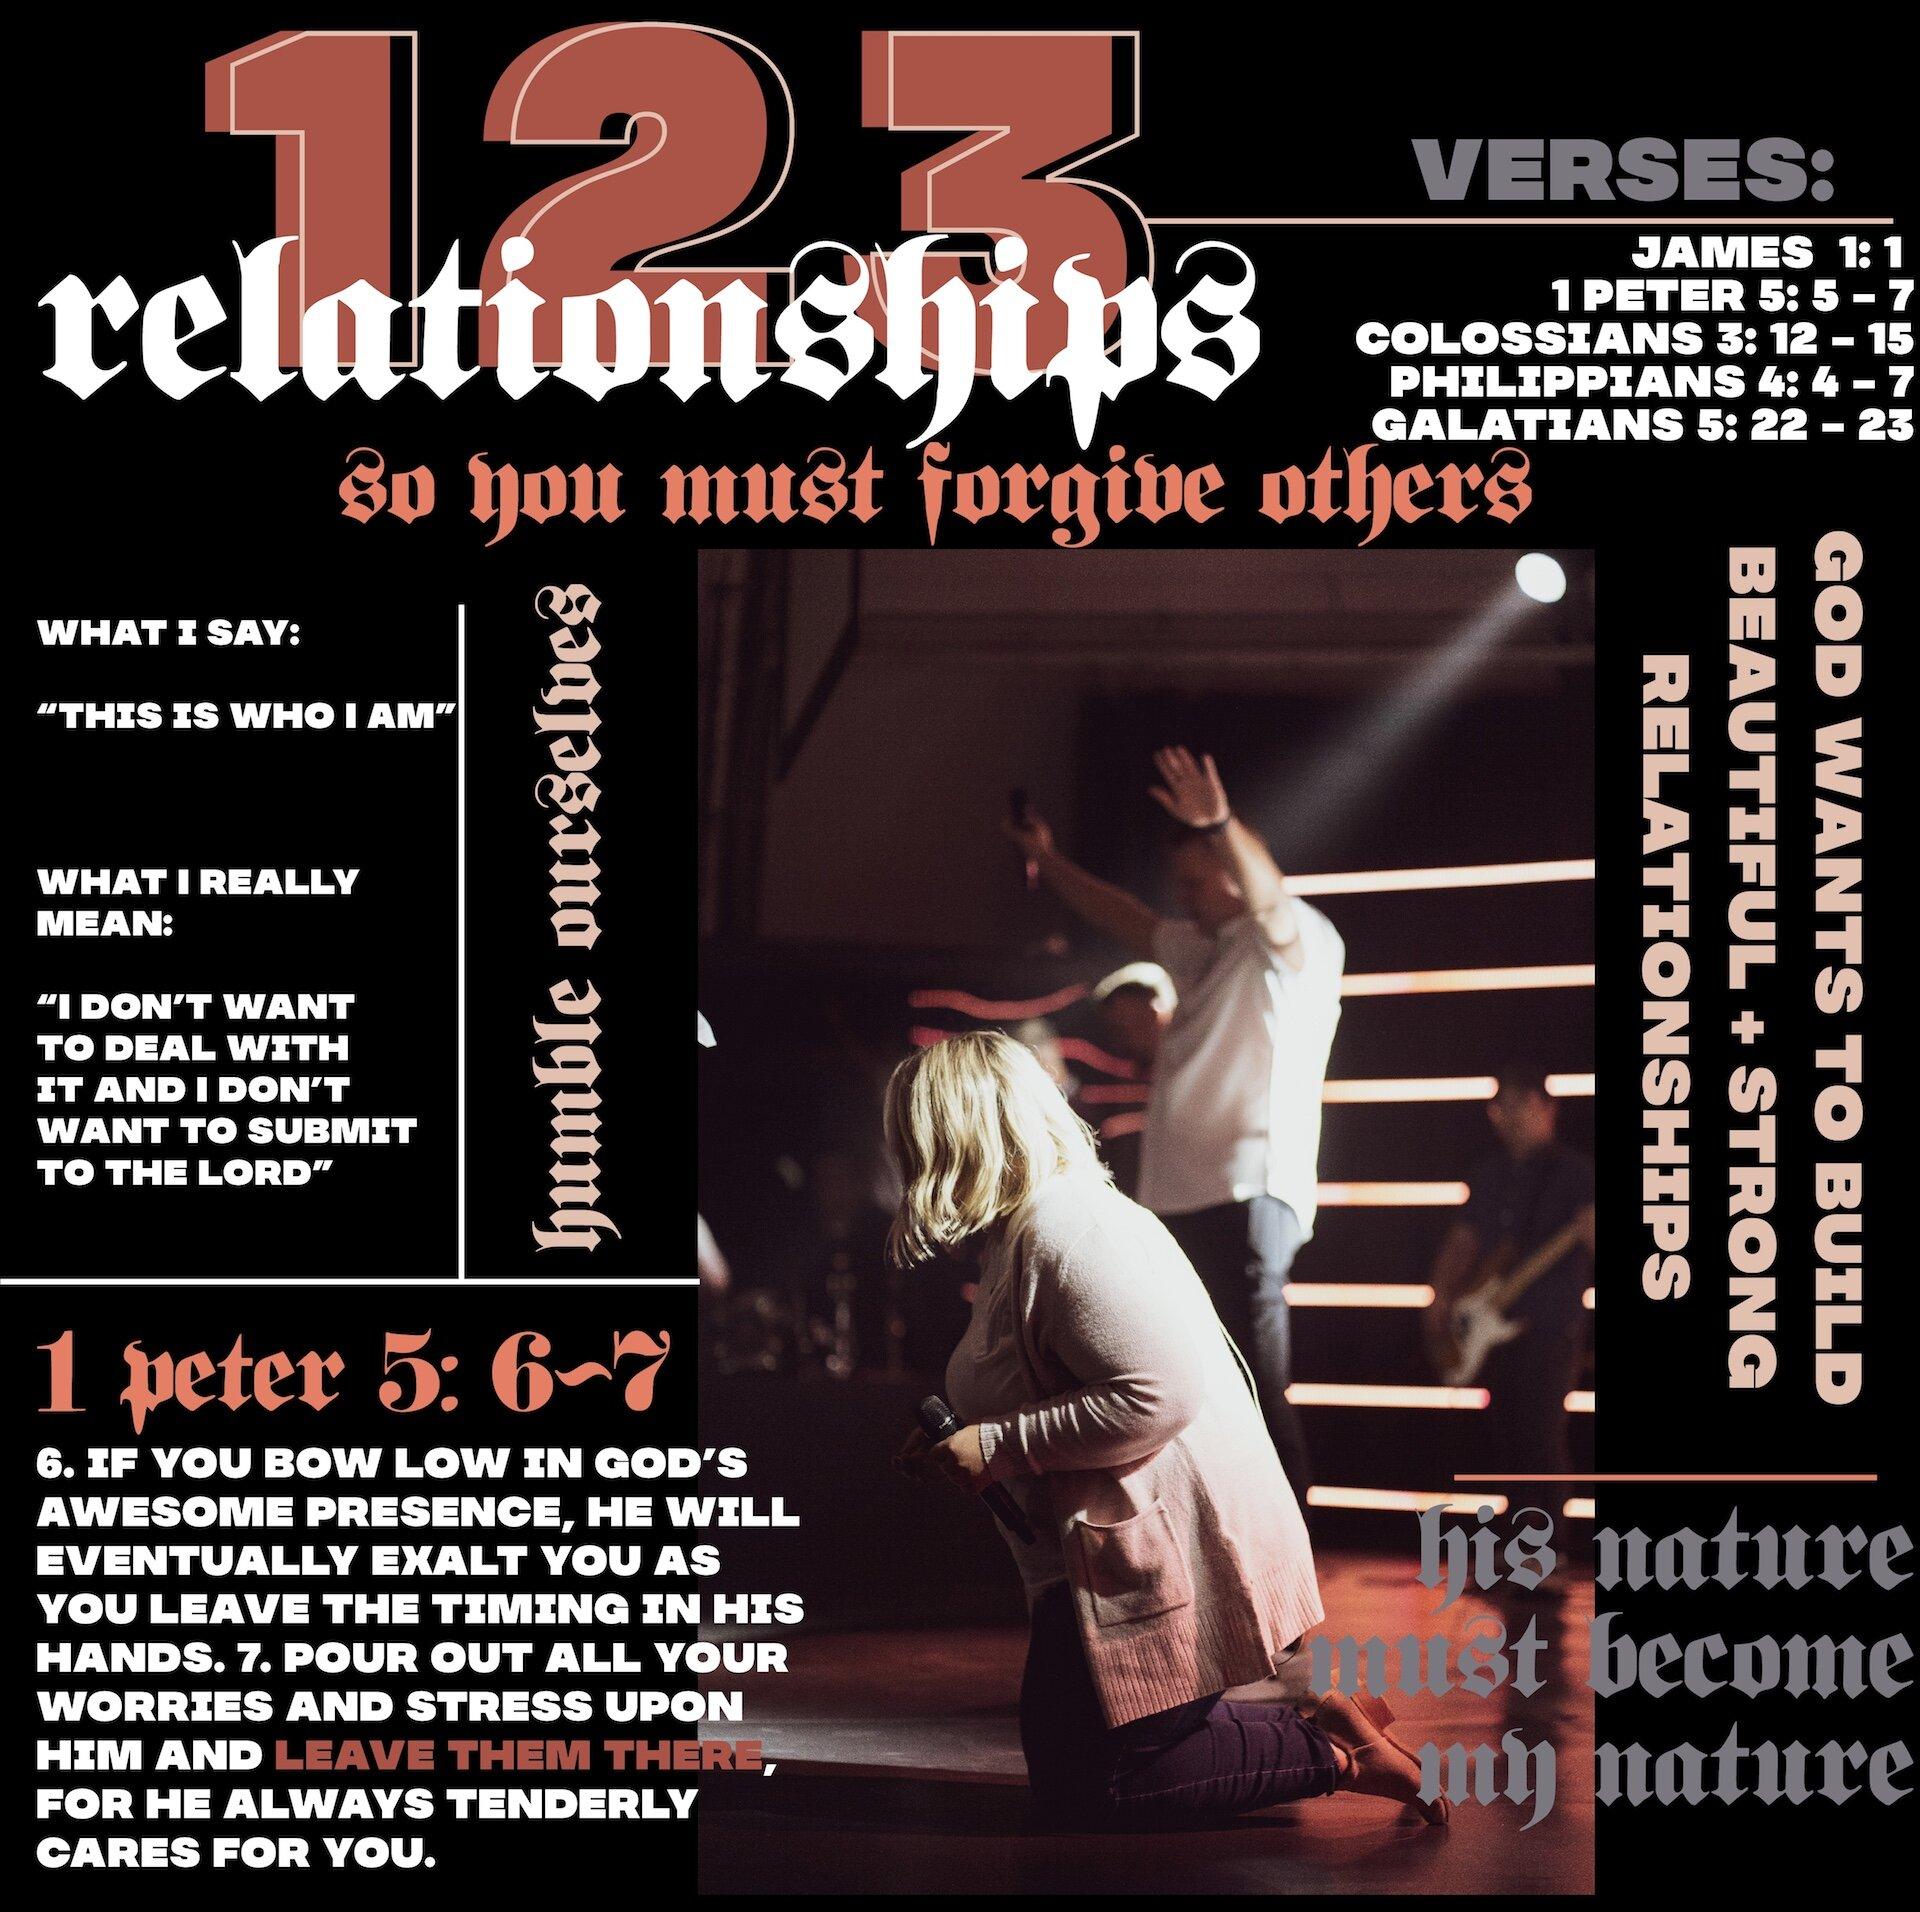 MARRIAGE SERMON HIGHLIGHT SQUARE - SEPT 22